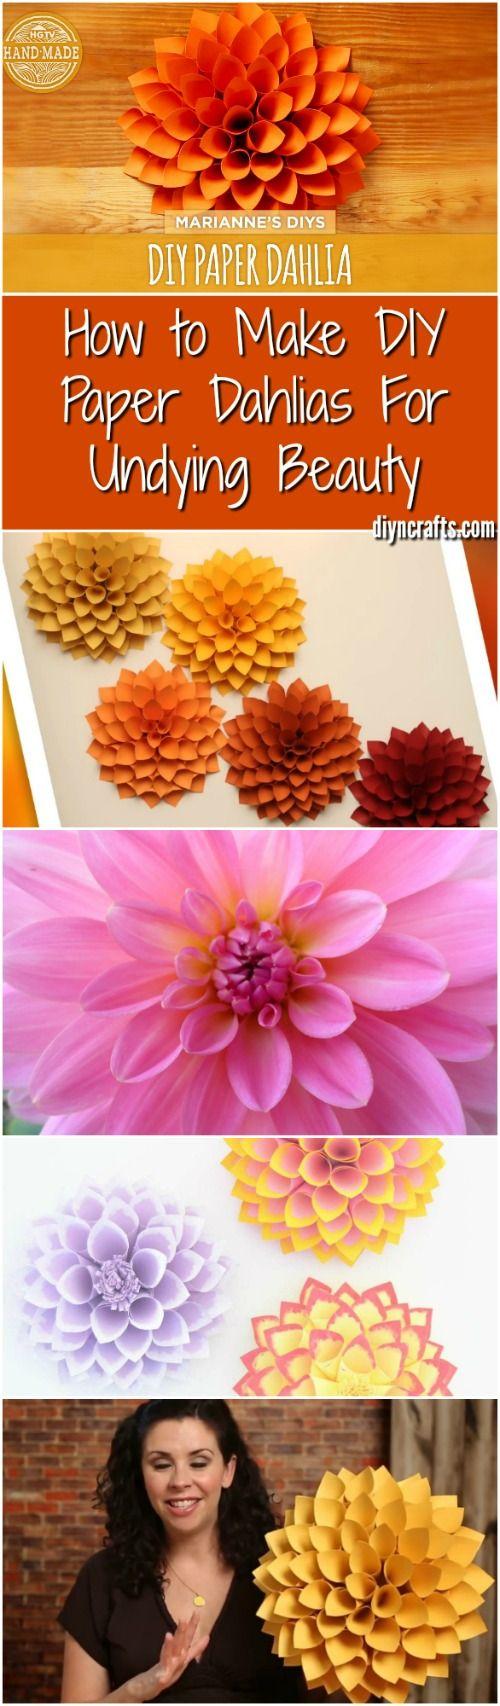 25  best ideas about Paper dahlia on Pinterest   Paper flowers diy  Paper  flowers and Handmade paper flowers. 25  best ideas about Paper dahlia on Pinterest   Paper flowers diy